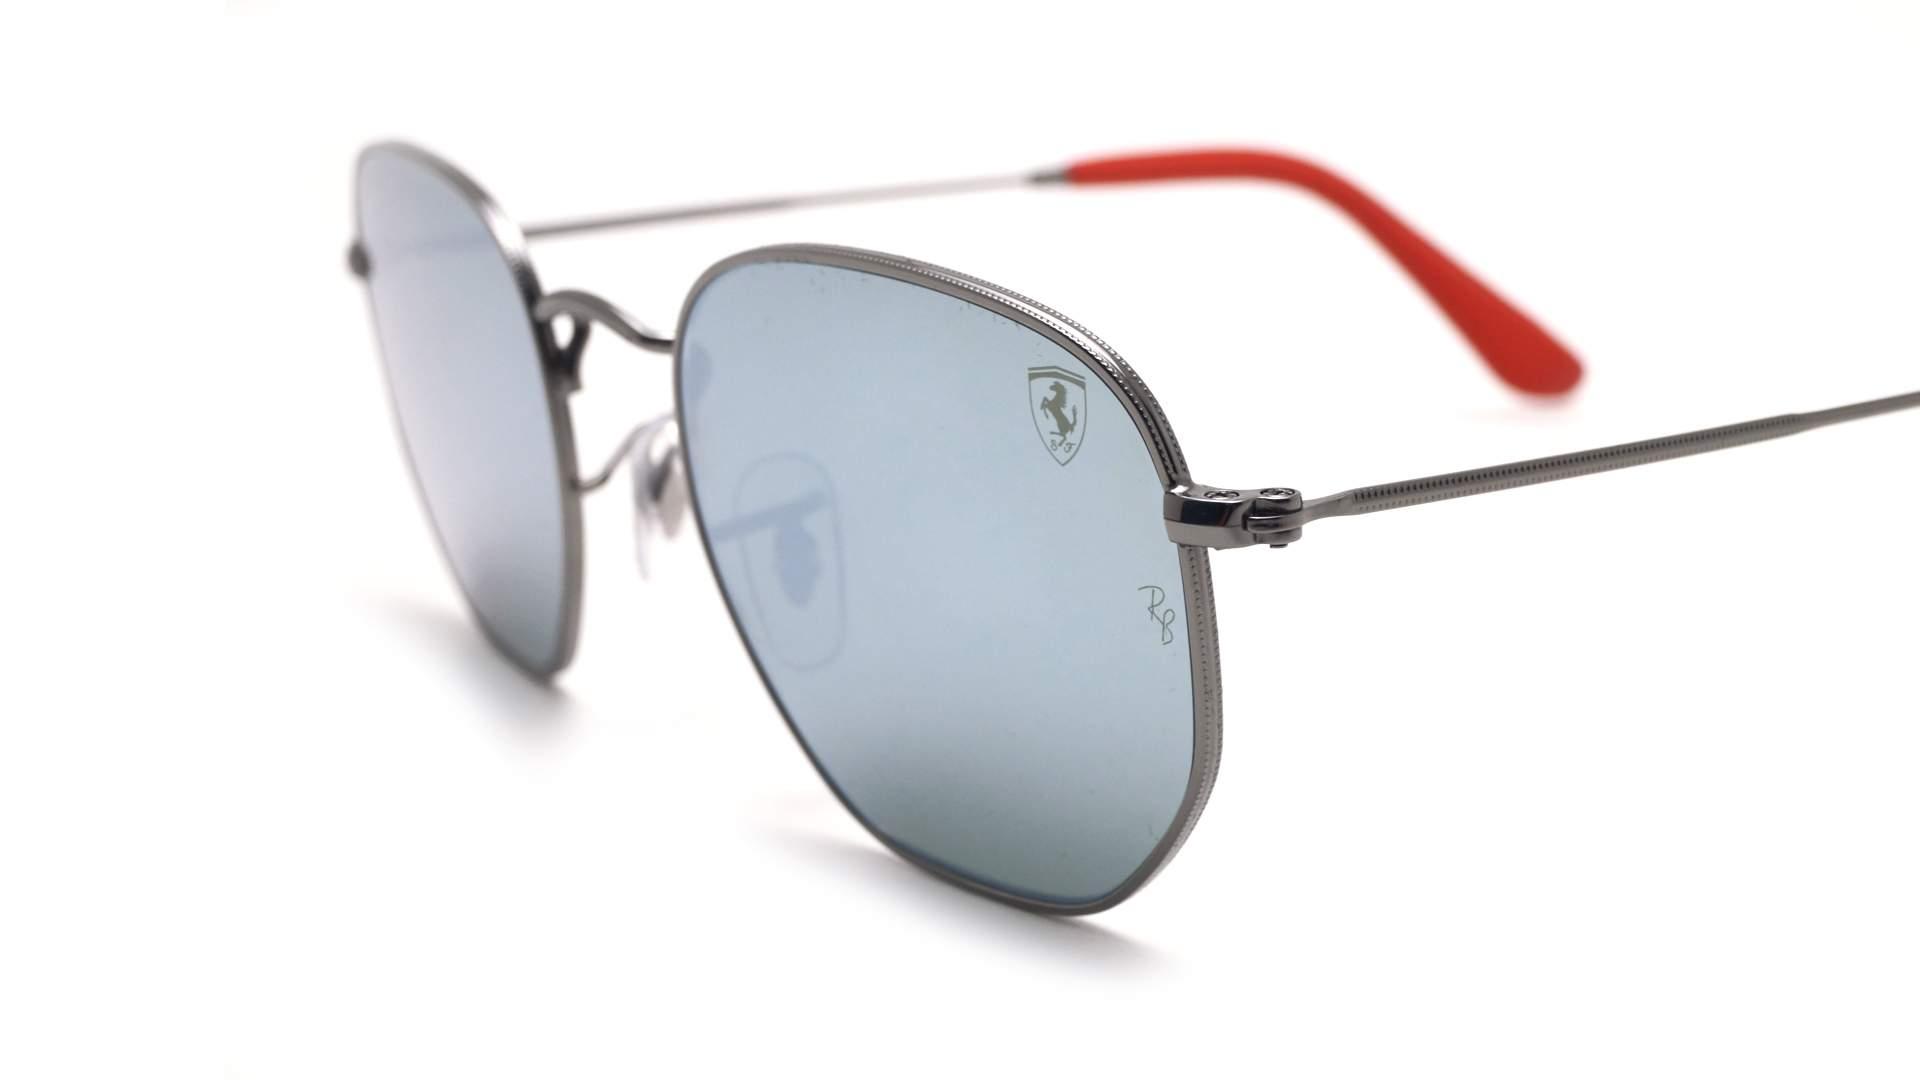 95de2ea5e8 Sunglasses Ray-Ban Hexagonal Scuderia Ferrari Silver RB3548NM F001 30 51-21  Medium Mirror